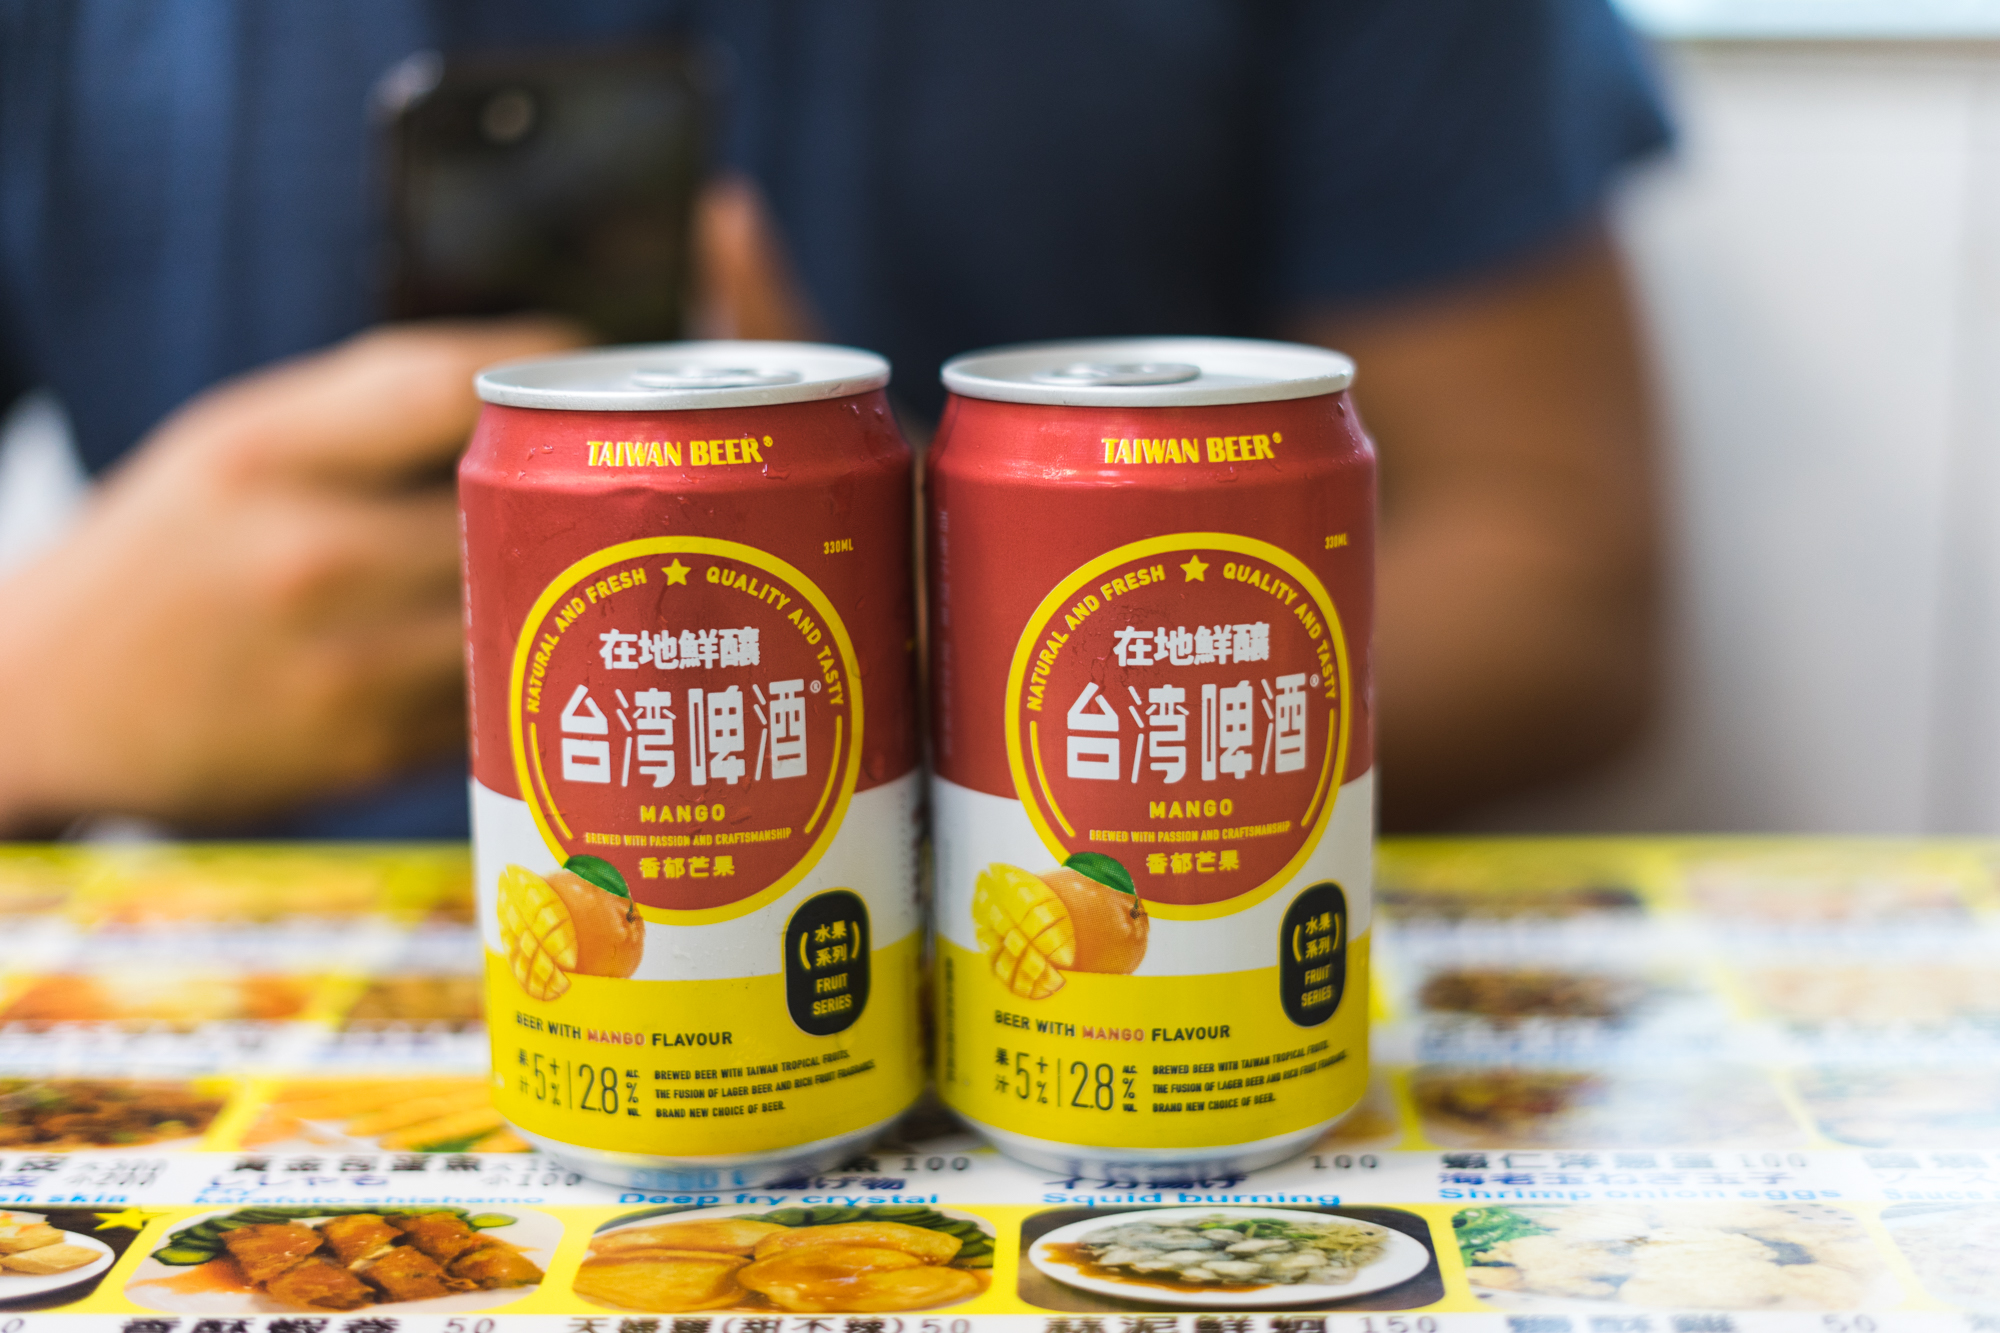 Taiwanese Mango Beer